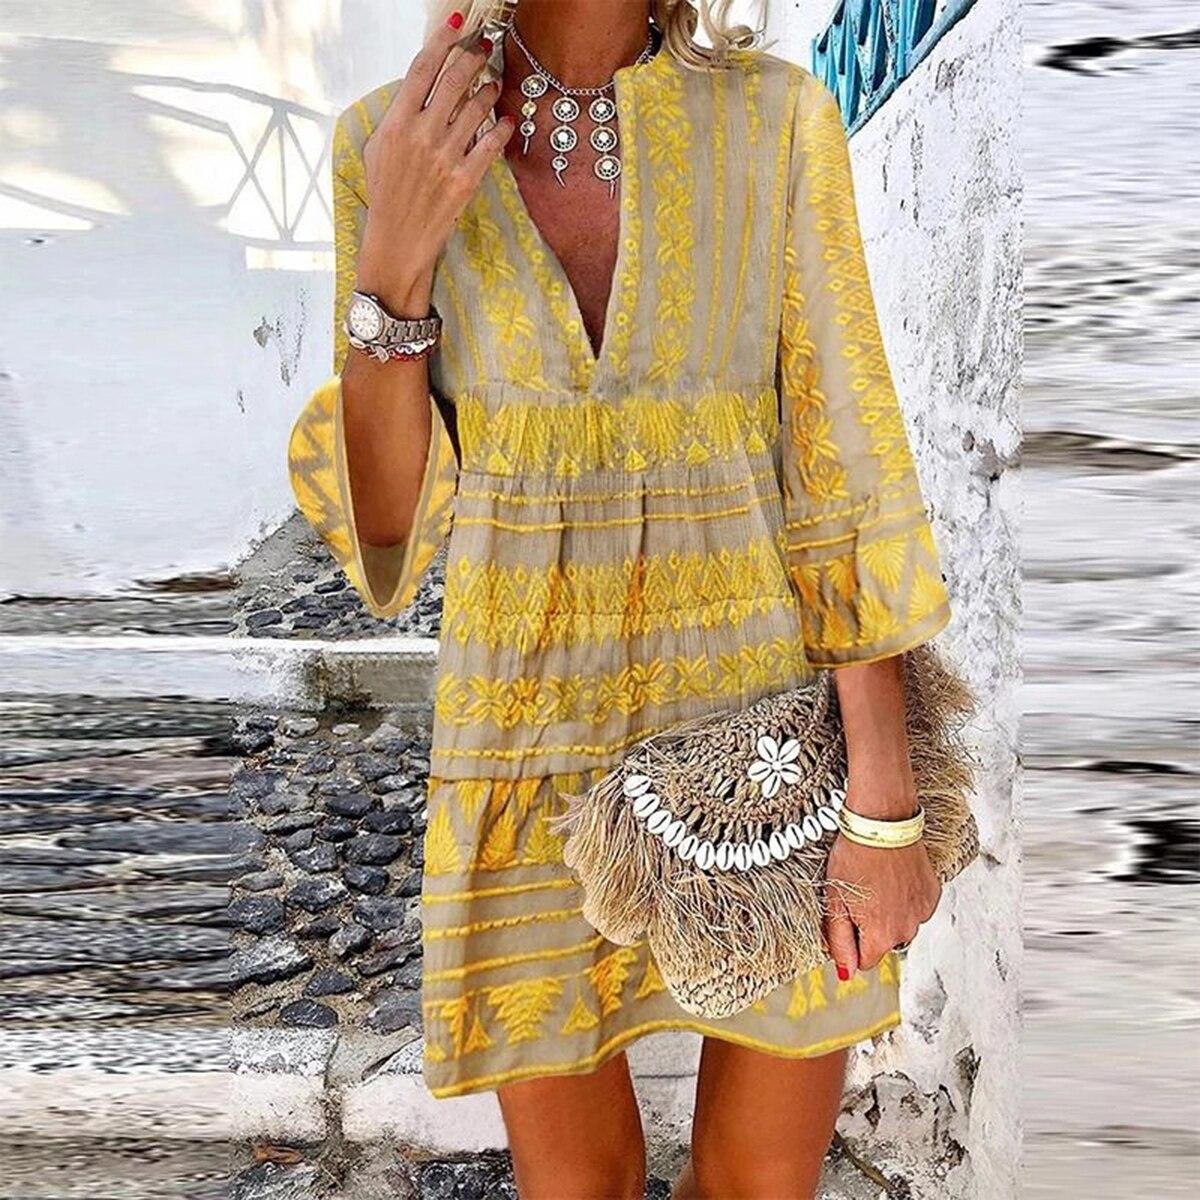 Jastie Vintage Casual Women Dress Chic Print Bohemian Beach Dresses V-Neck Long Sleeve Short Boho Dress Female Vestidos 2020